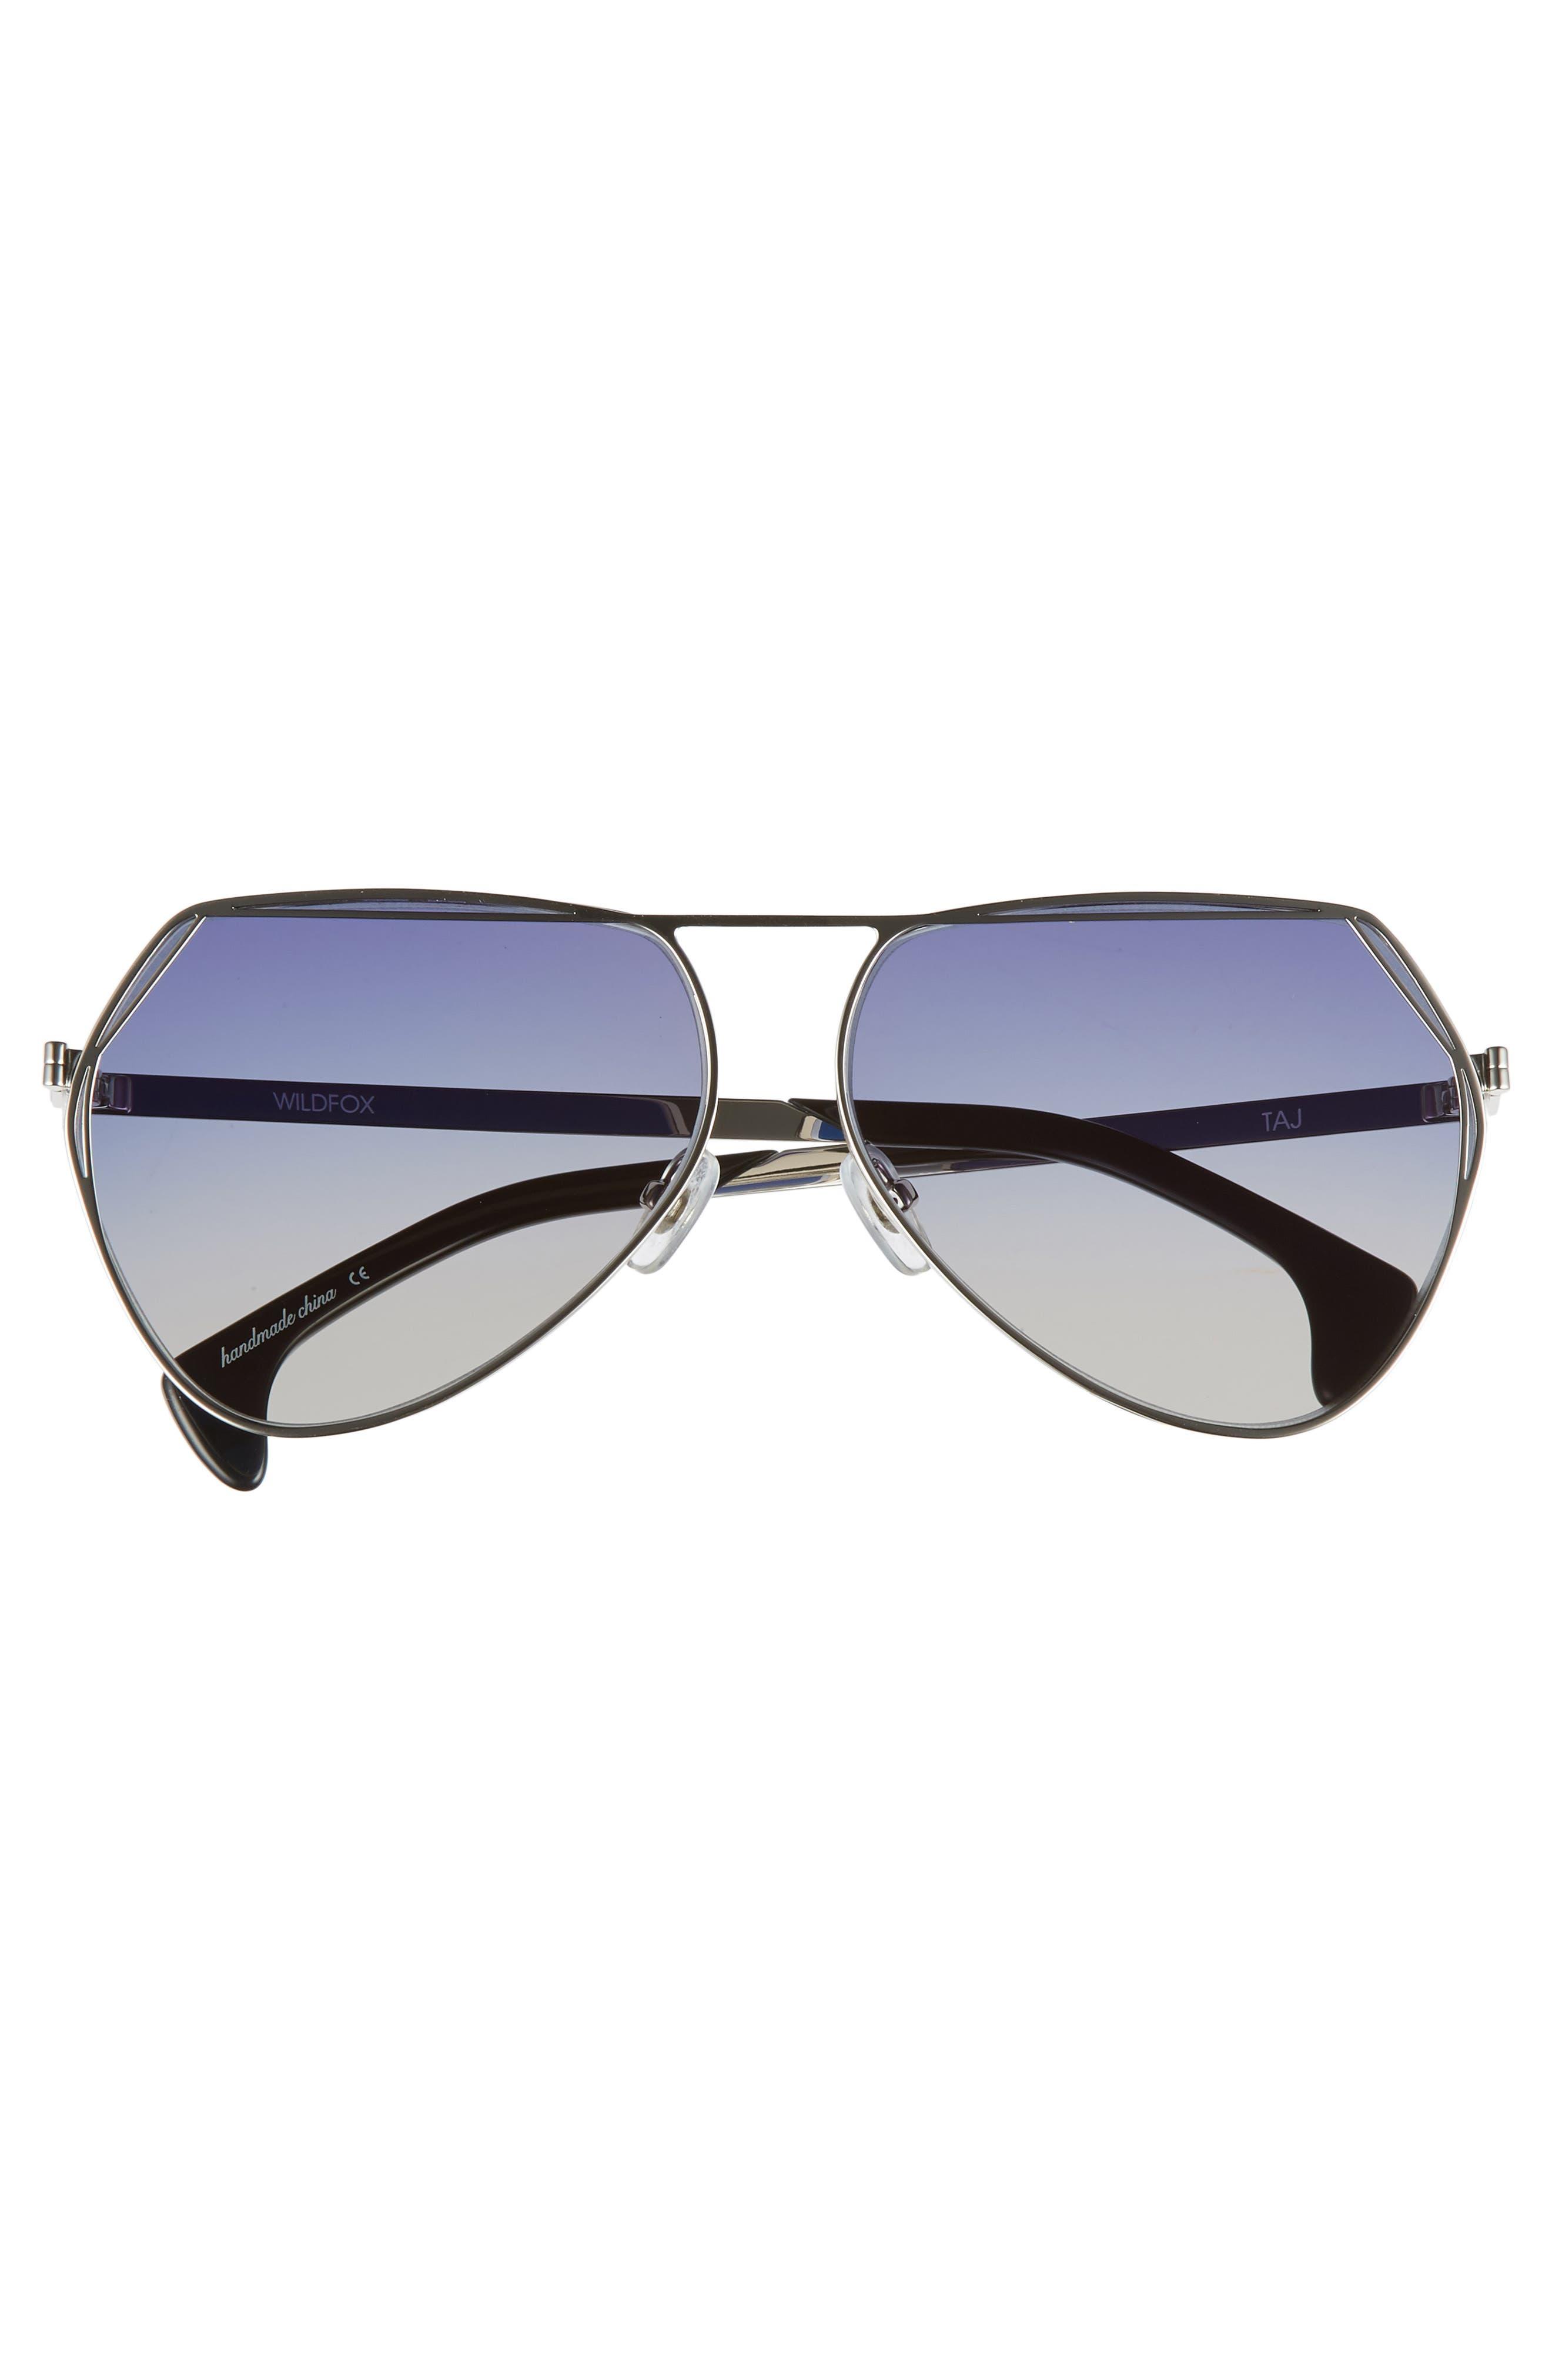 Taj 62mm Oversize Aviator Sunglasses,                             Alternate thumbnail 3, color,                             SILVER/ GREY-BLUE GRADIENT